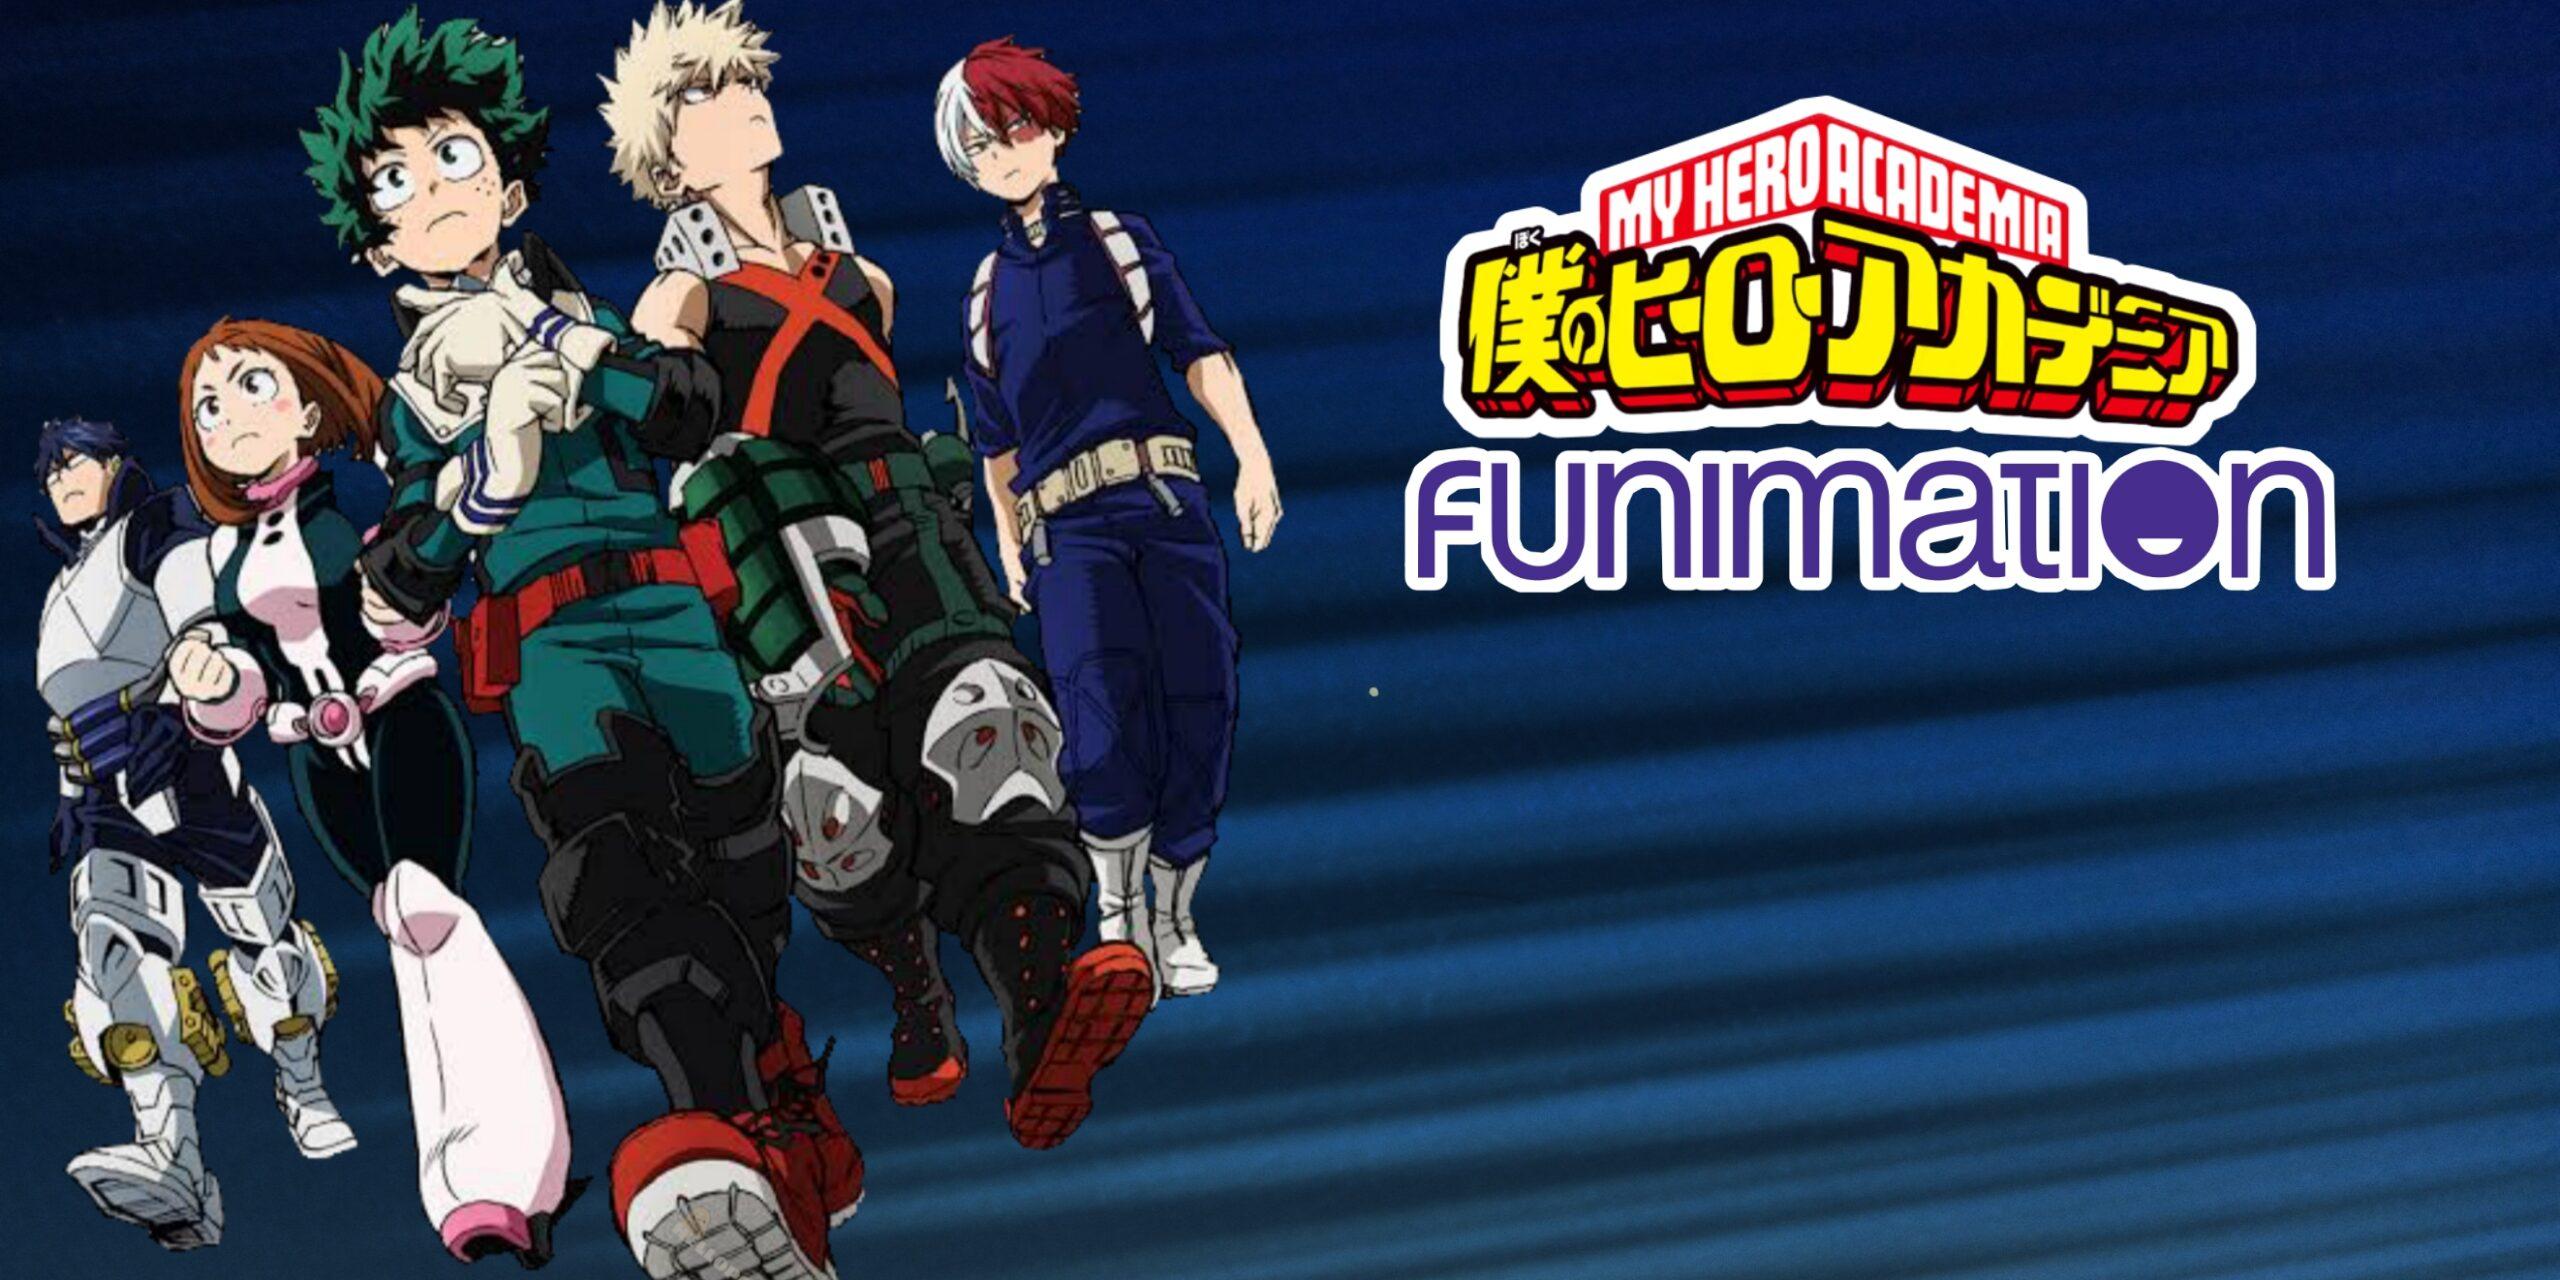 My Hero Academia vai estar no catálogo da Funimation Br, e…